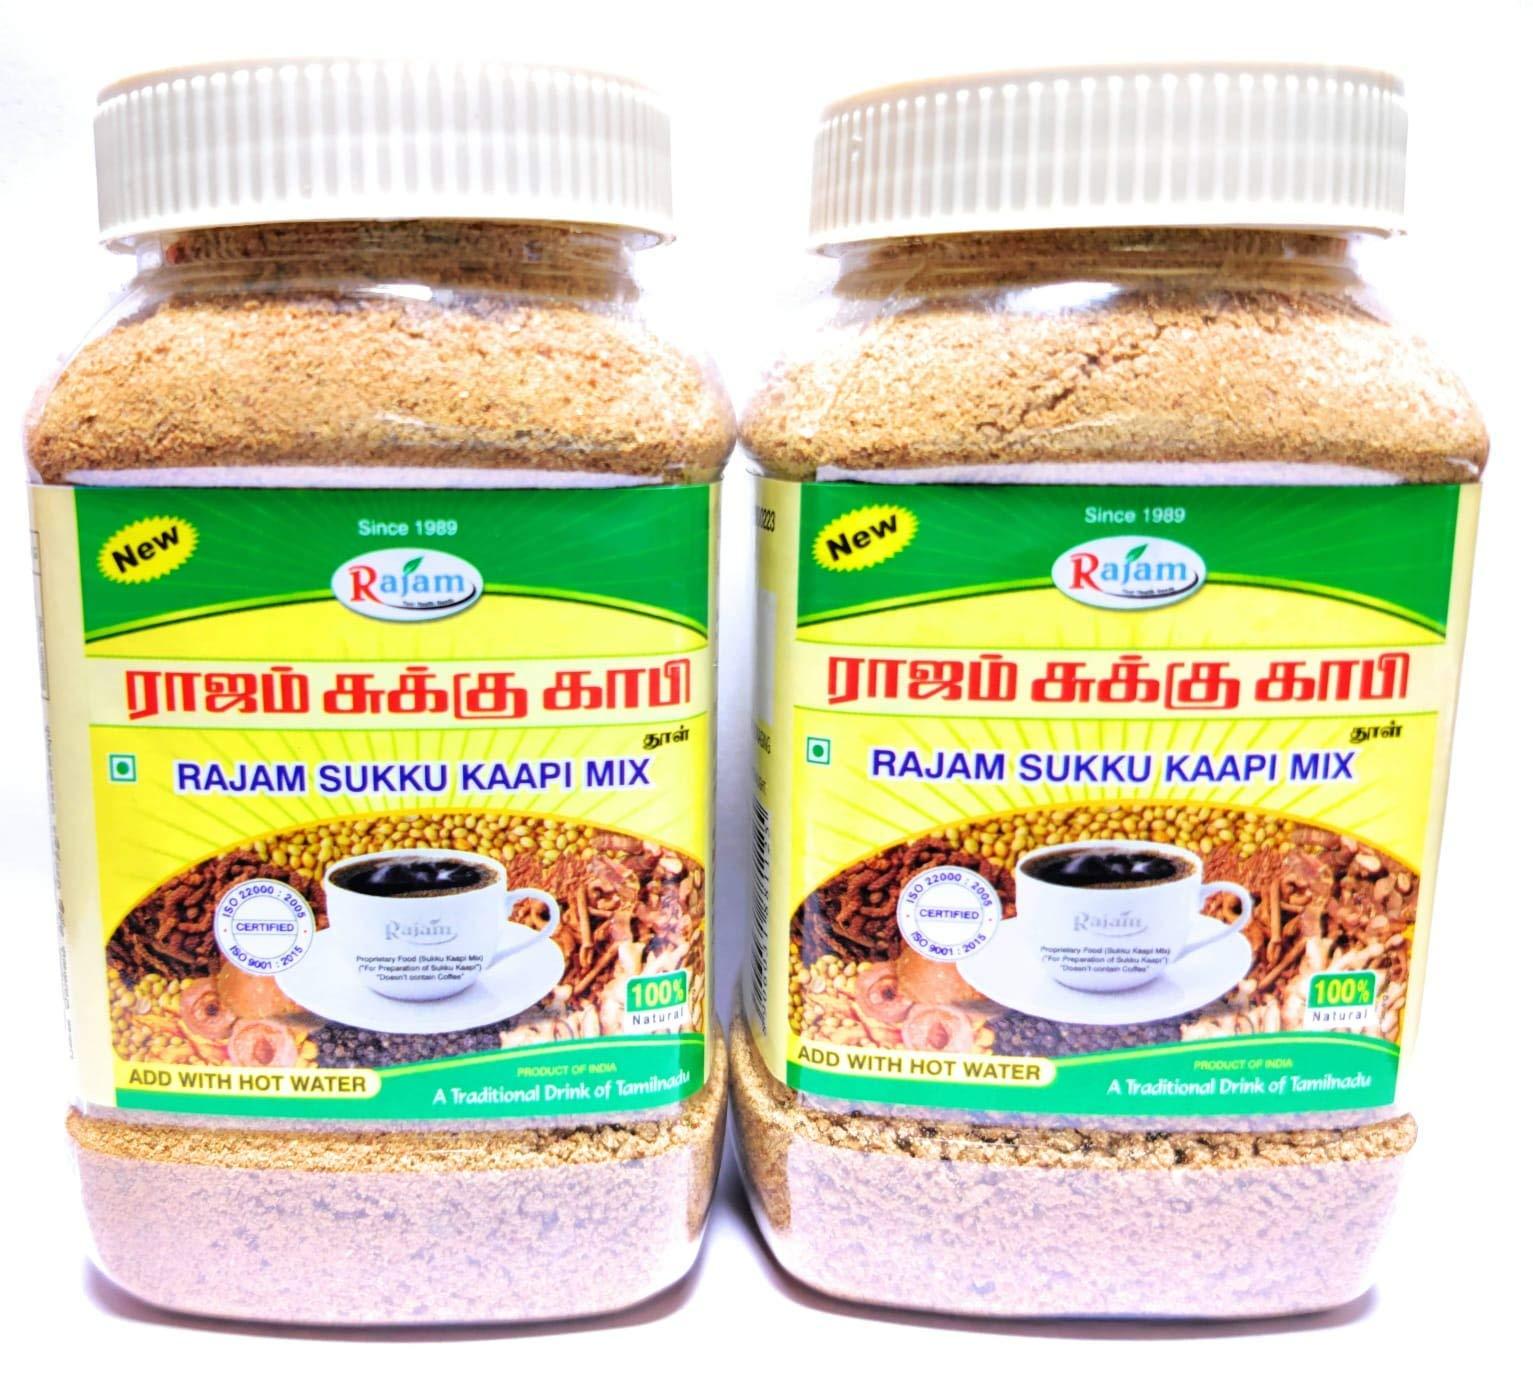 Rajam Sukku Coffee Powder 200G Jar Pack of 2 (rajam Sukku malli Powder)